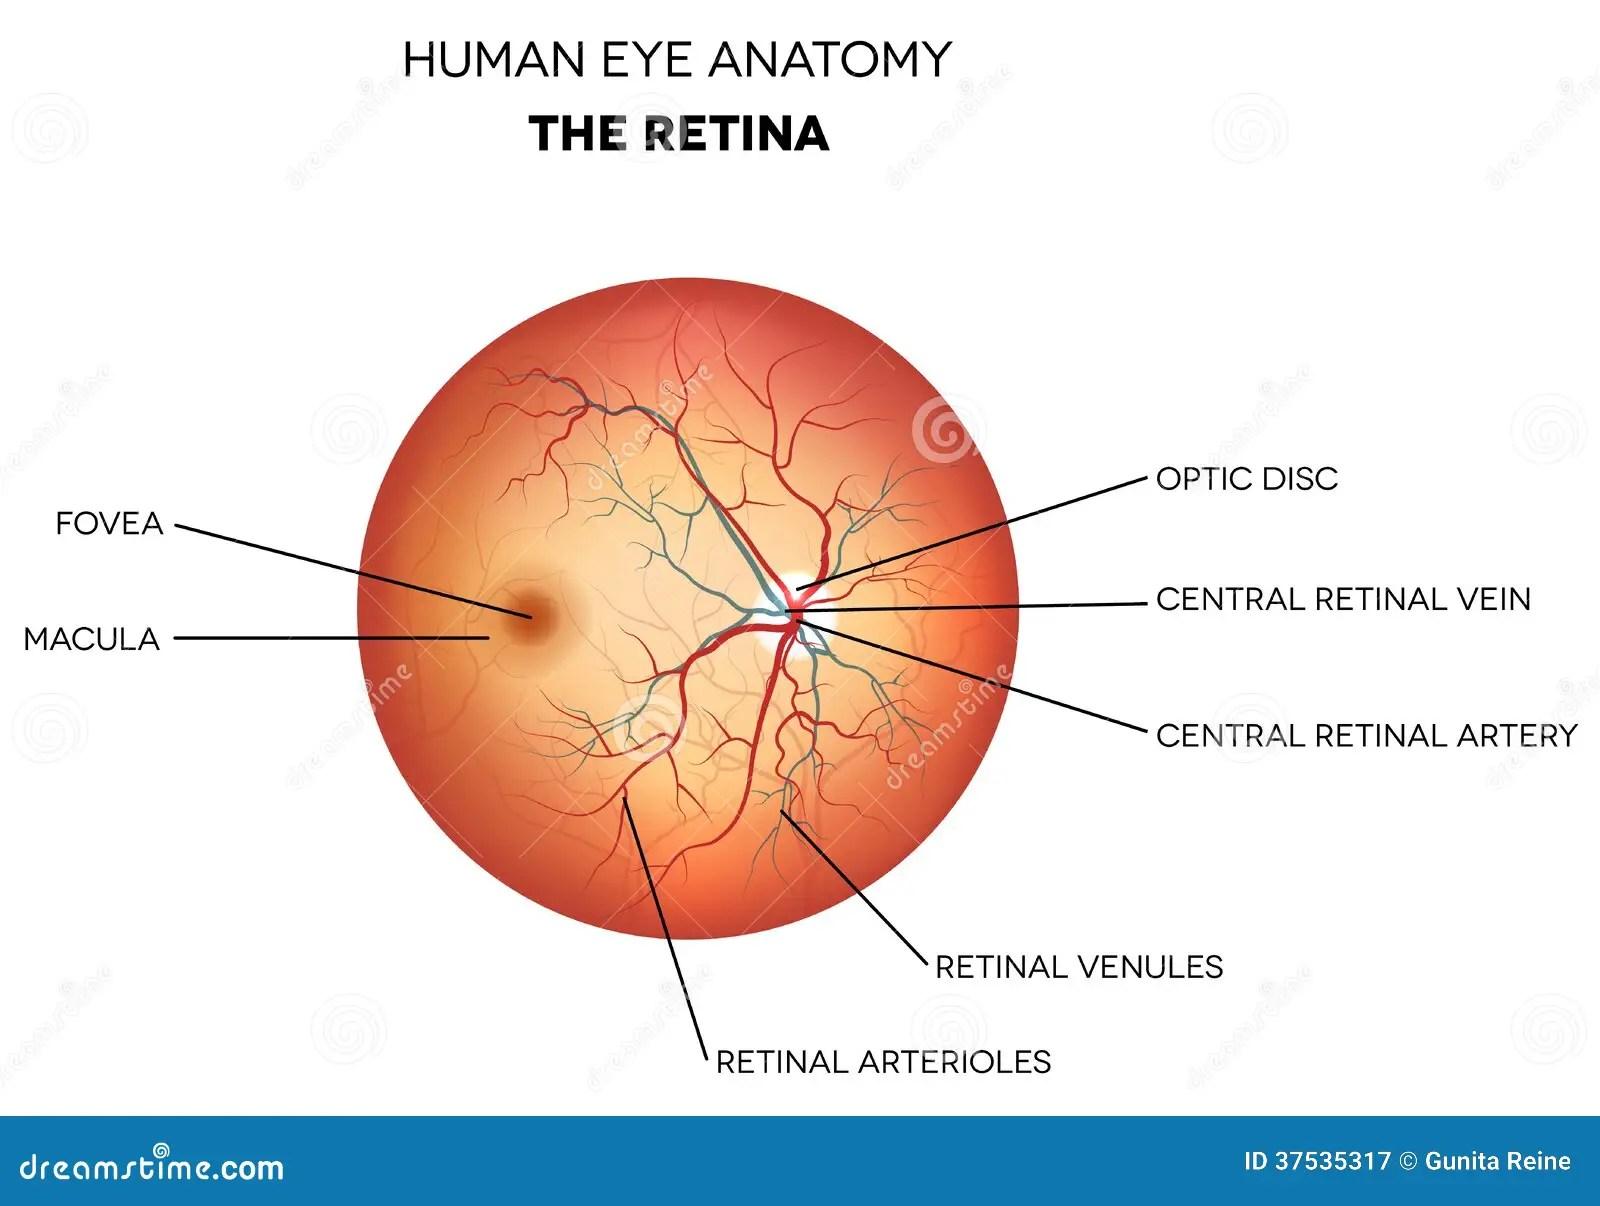 hight resolution of human eye anatomy retina stock vector illustration of eyes 37535317 rh dreamstime com eye diagram label human eye diagram labeled